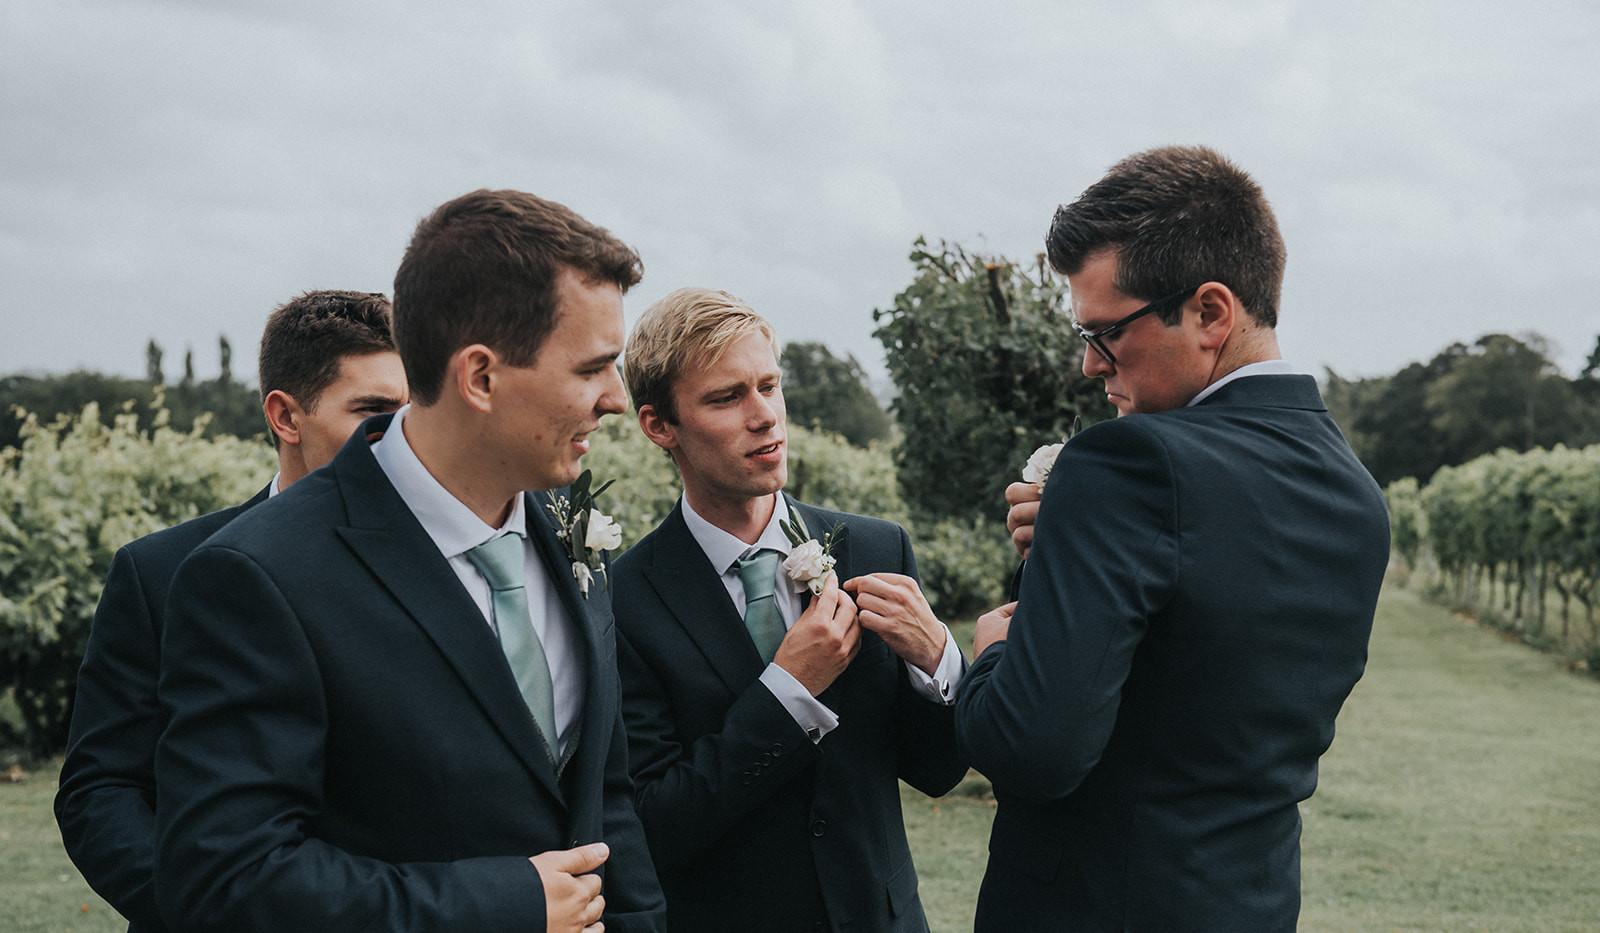 Groomsmen buttonholes